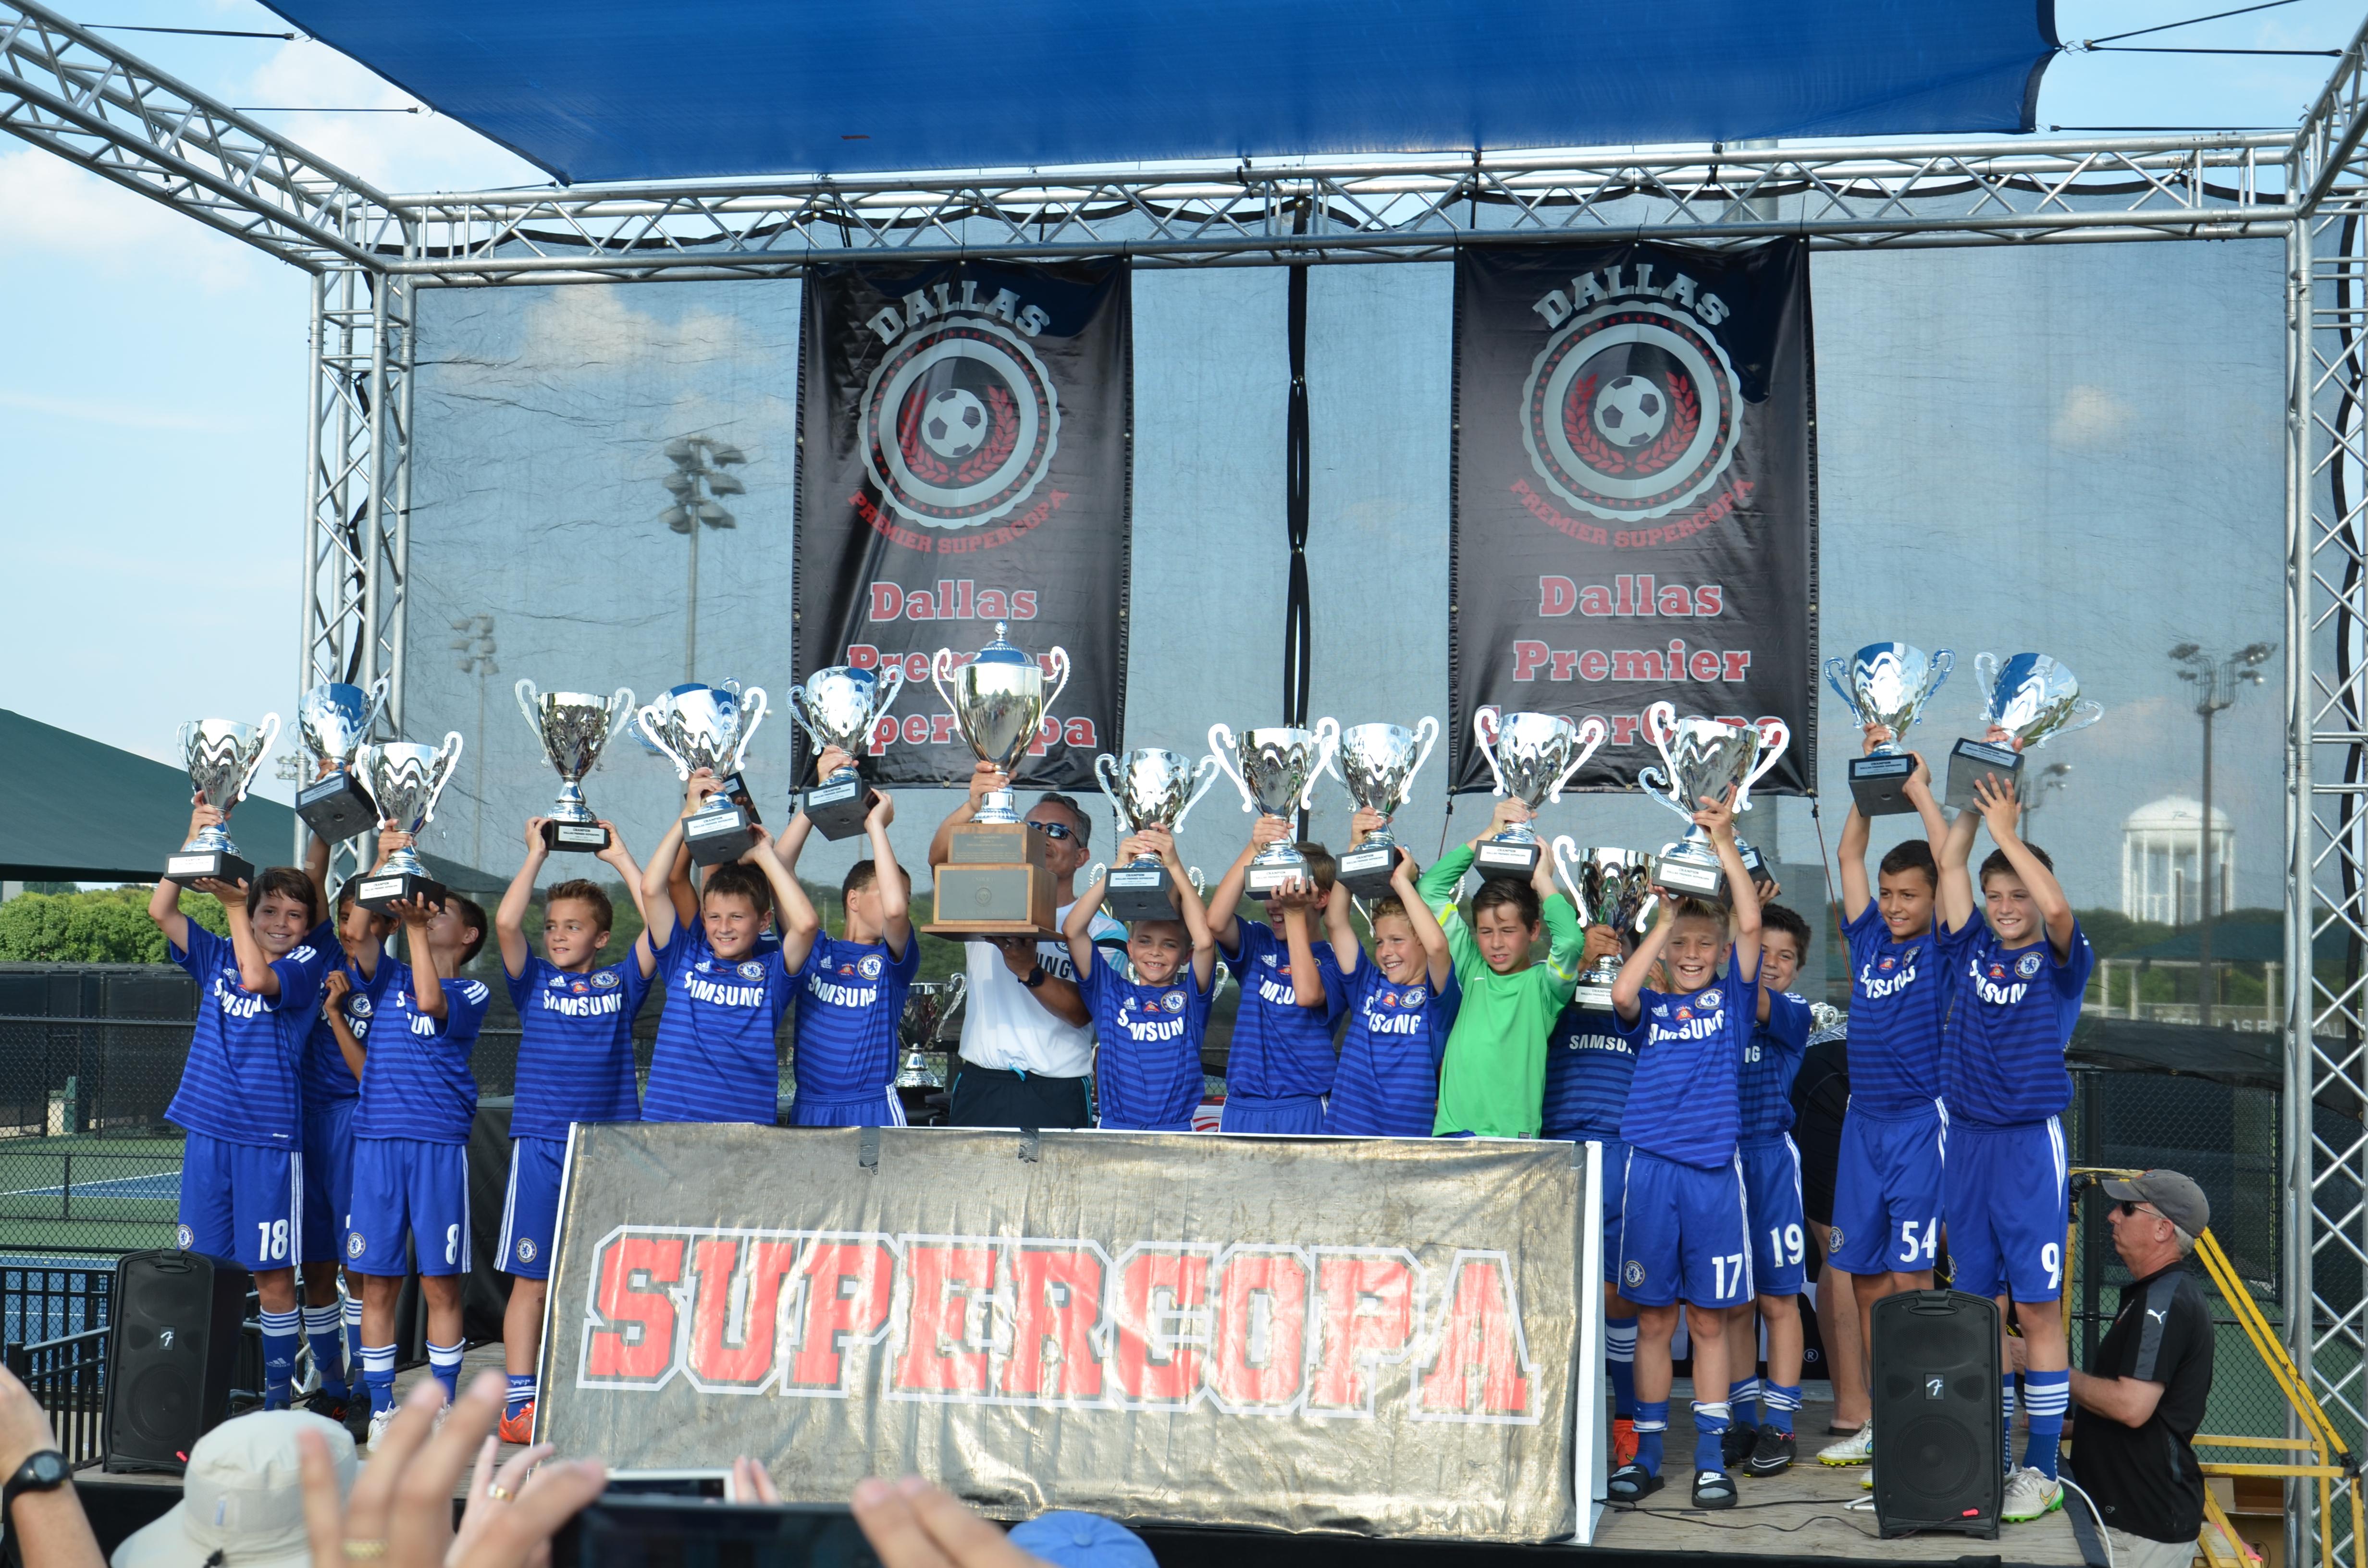 Solar Chelsea Red 04 Boys DeLeon - U11 CHAMPIONS.jpg